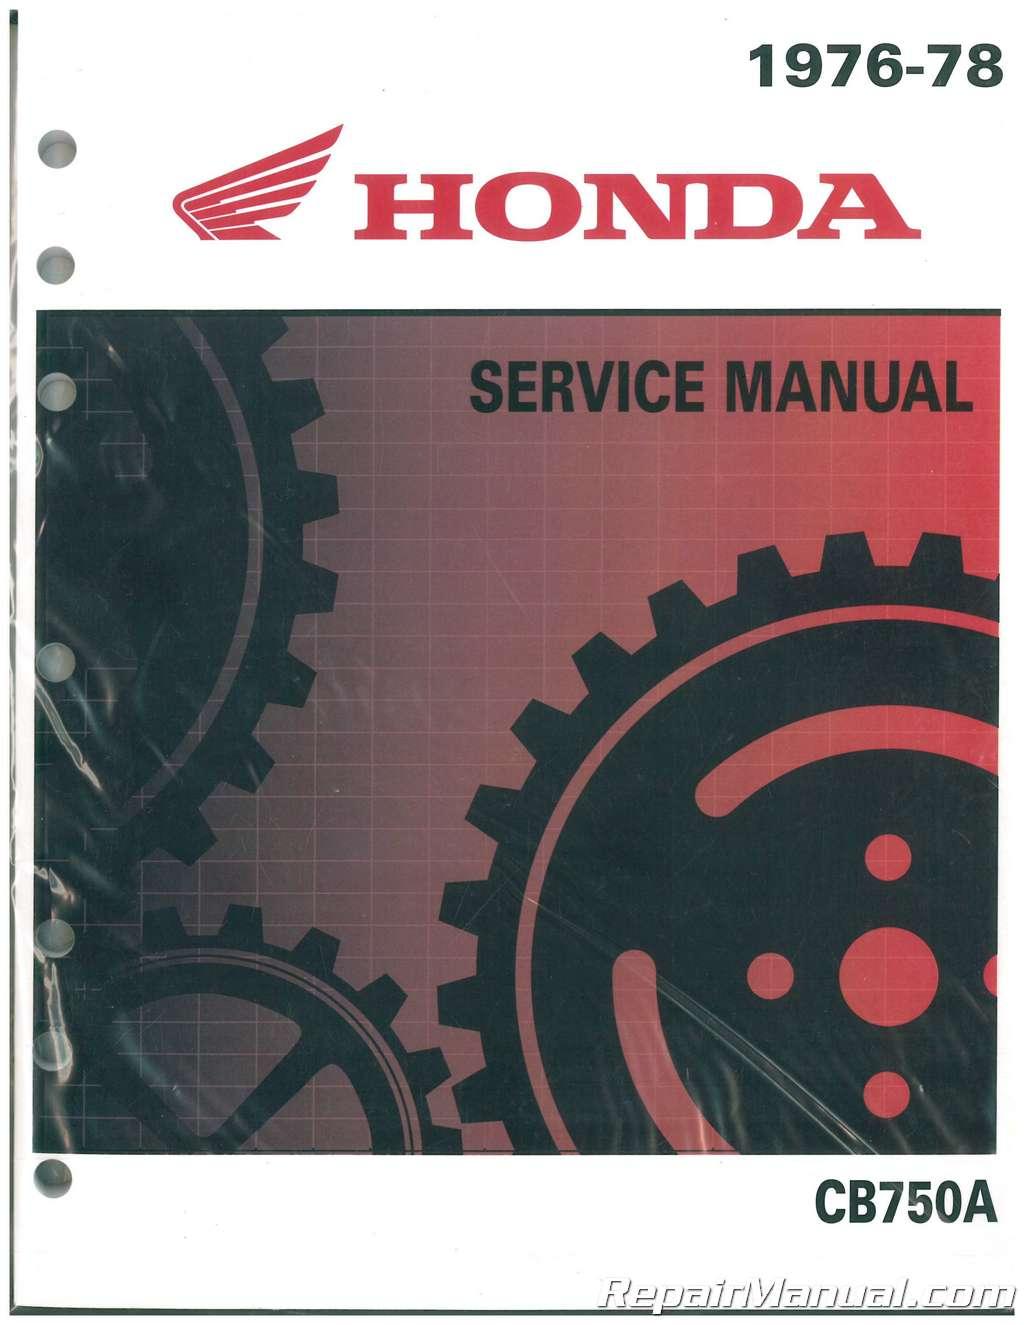 1976 1978 honda cb750a hondamatic motorcycle service manual rh repairmanual com honda cb 750 service manual pdf honda cb 750 service manual pdf